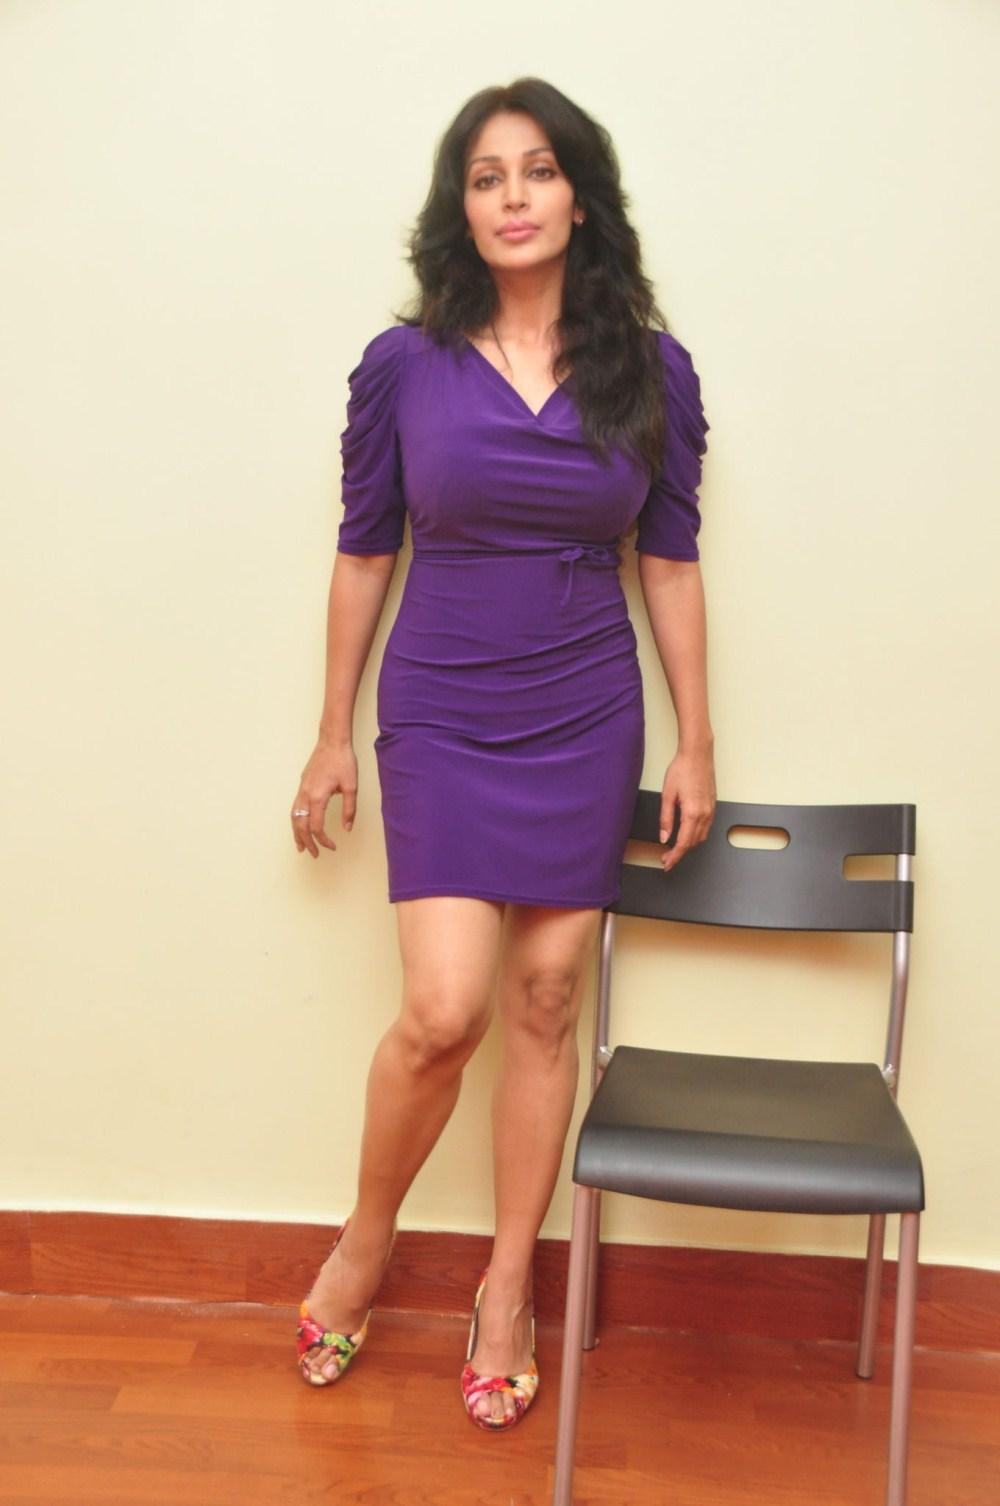 Celebration for celebrities: Asha saini new look pictures